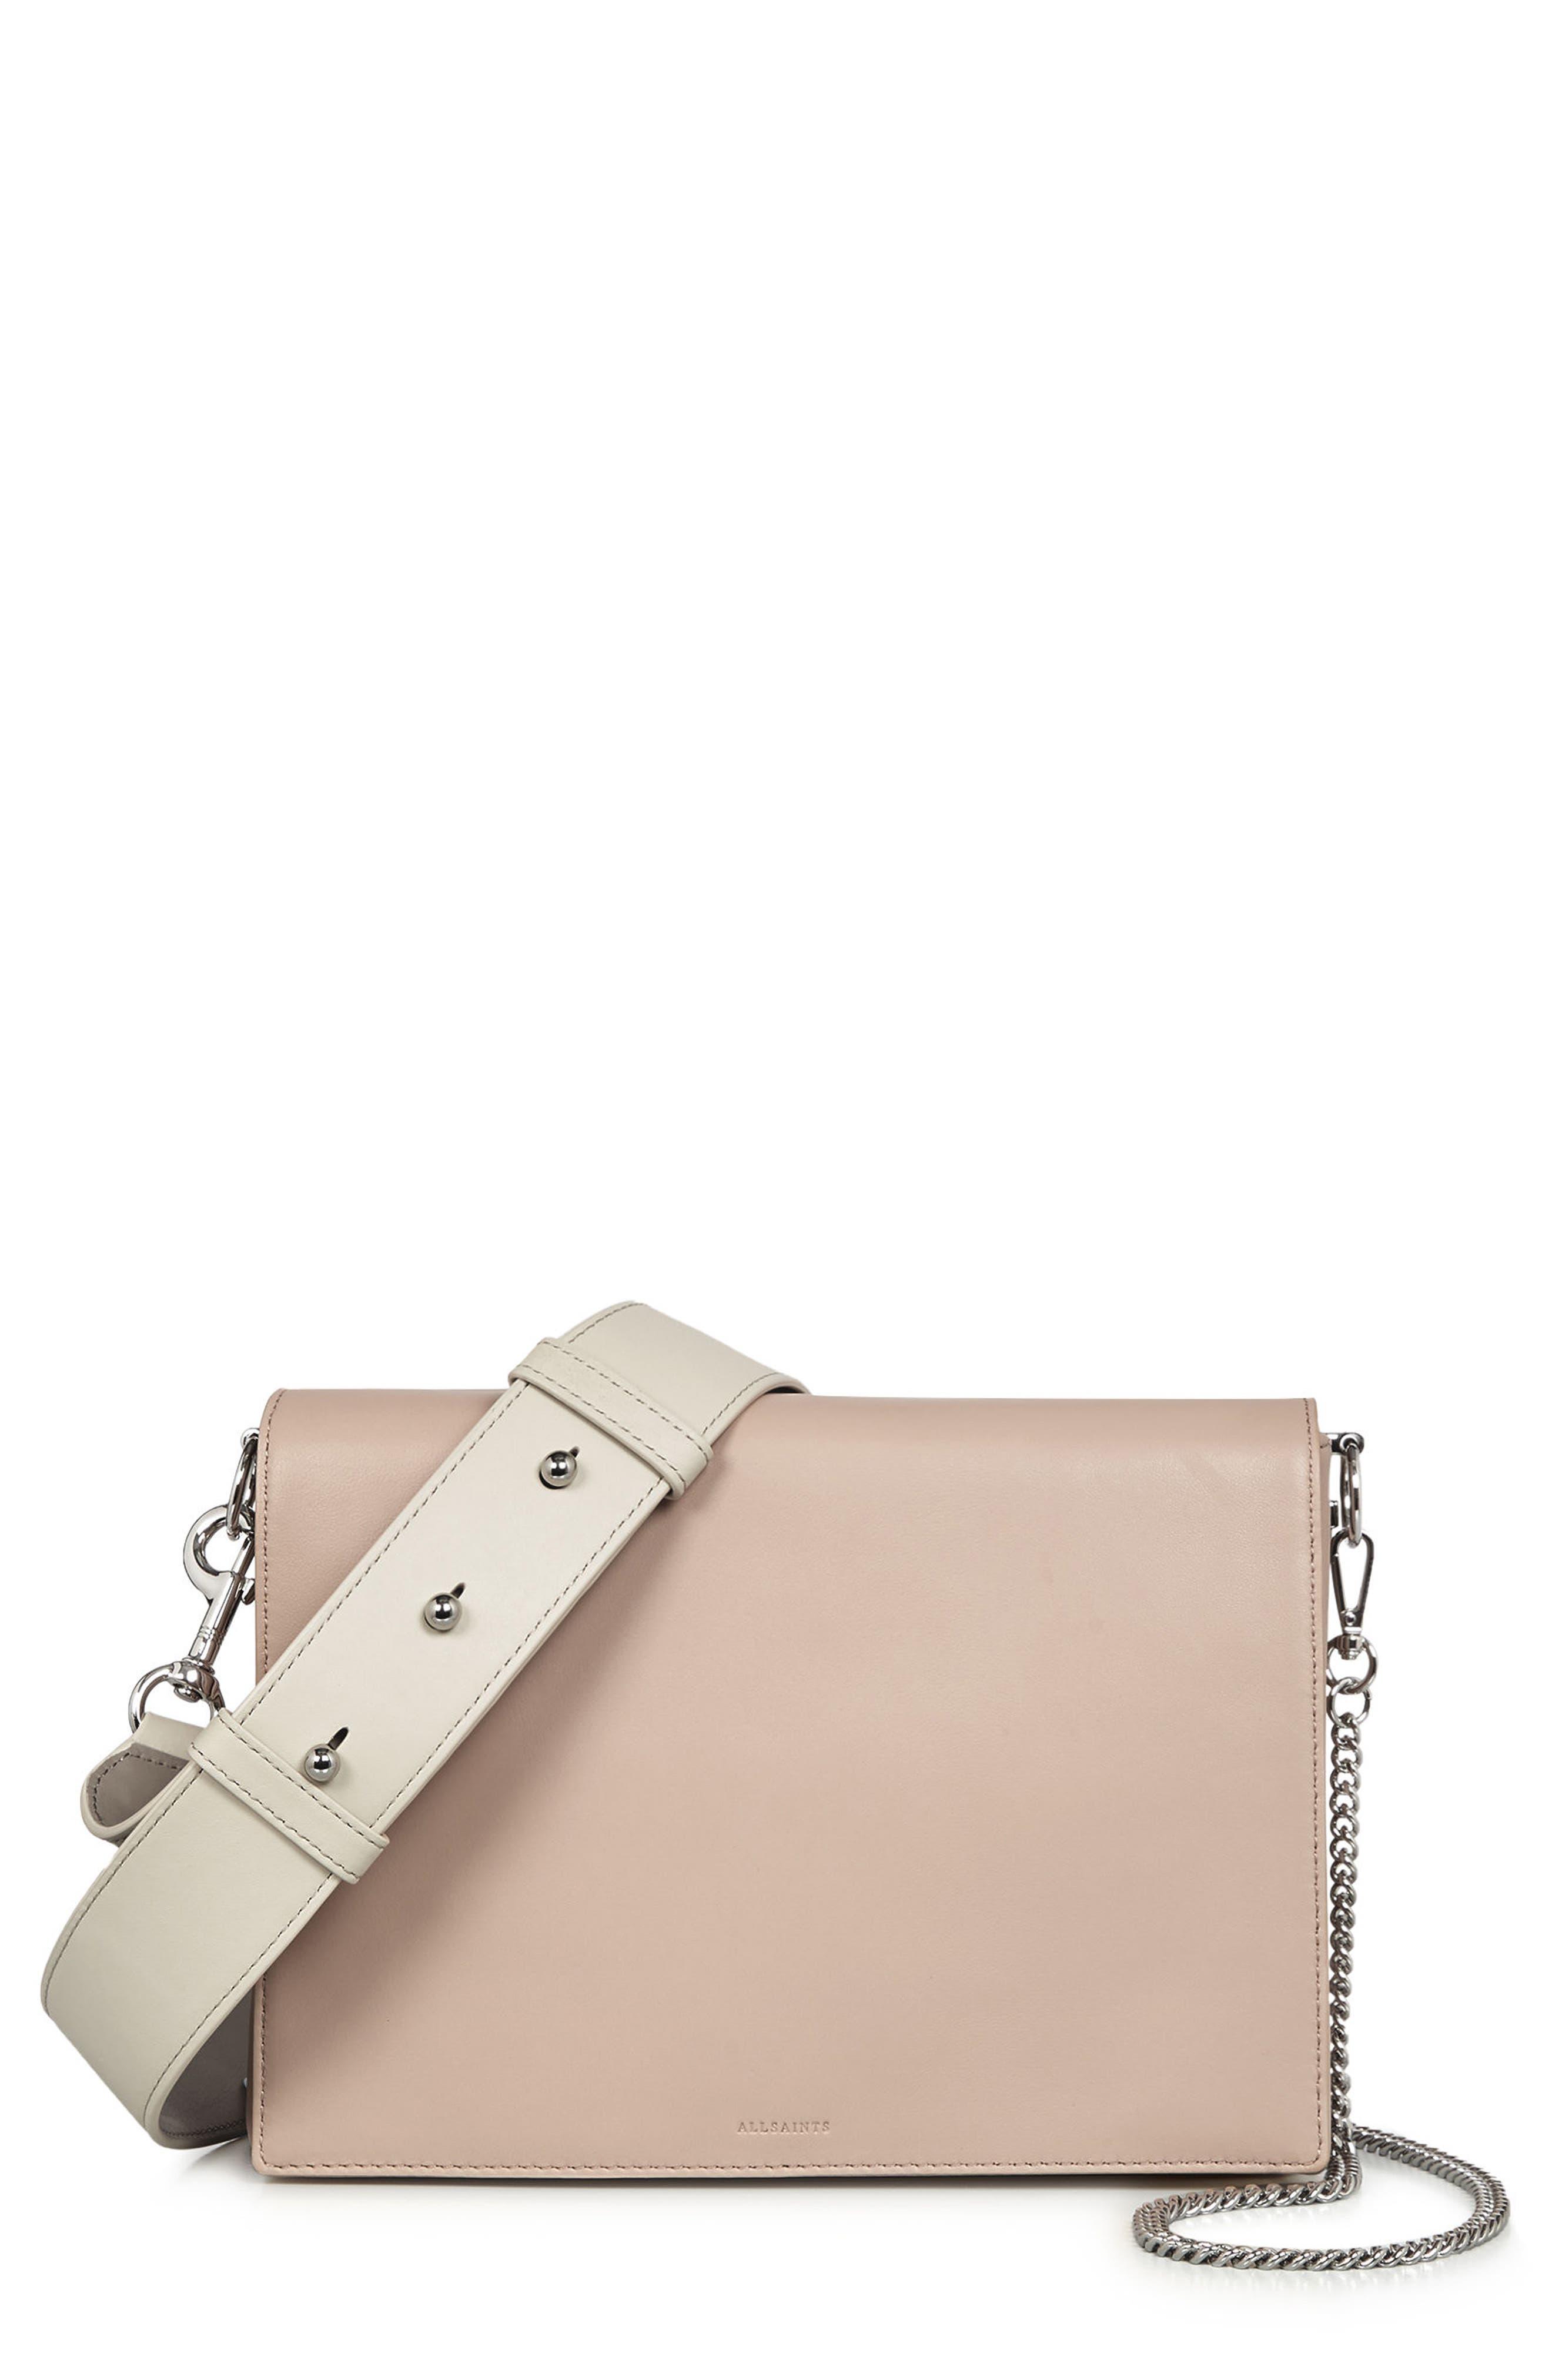 Zep Lambskin Leather Box Bag,                             Main thumbnail 1, color,                             Natural